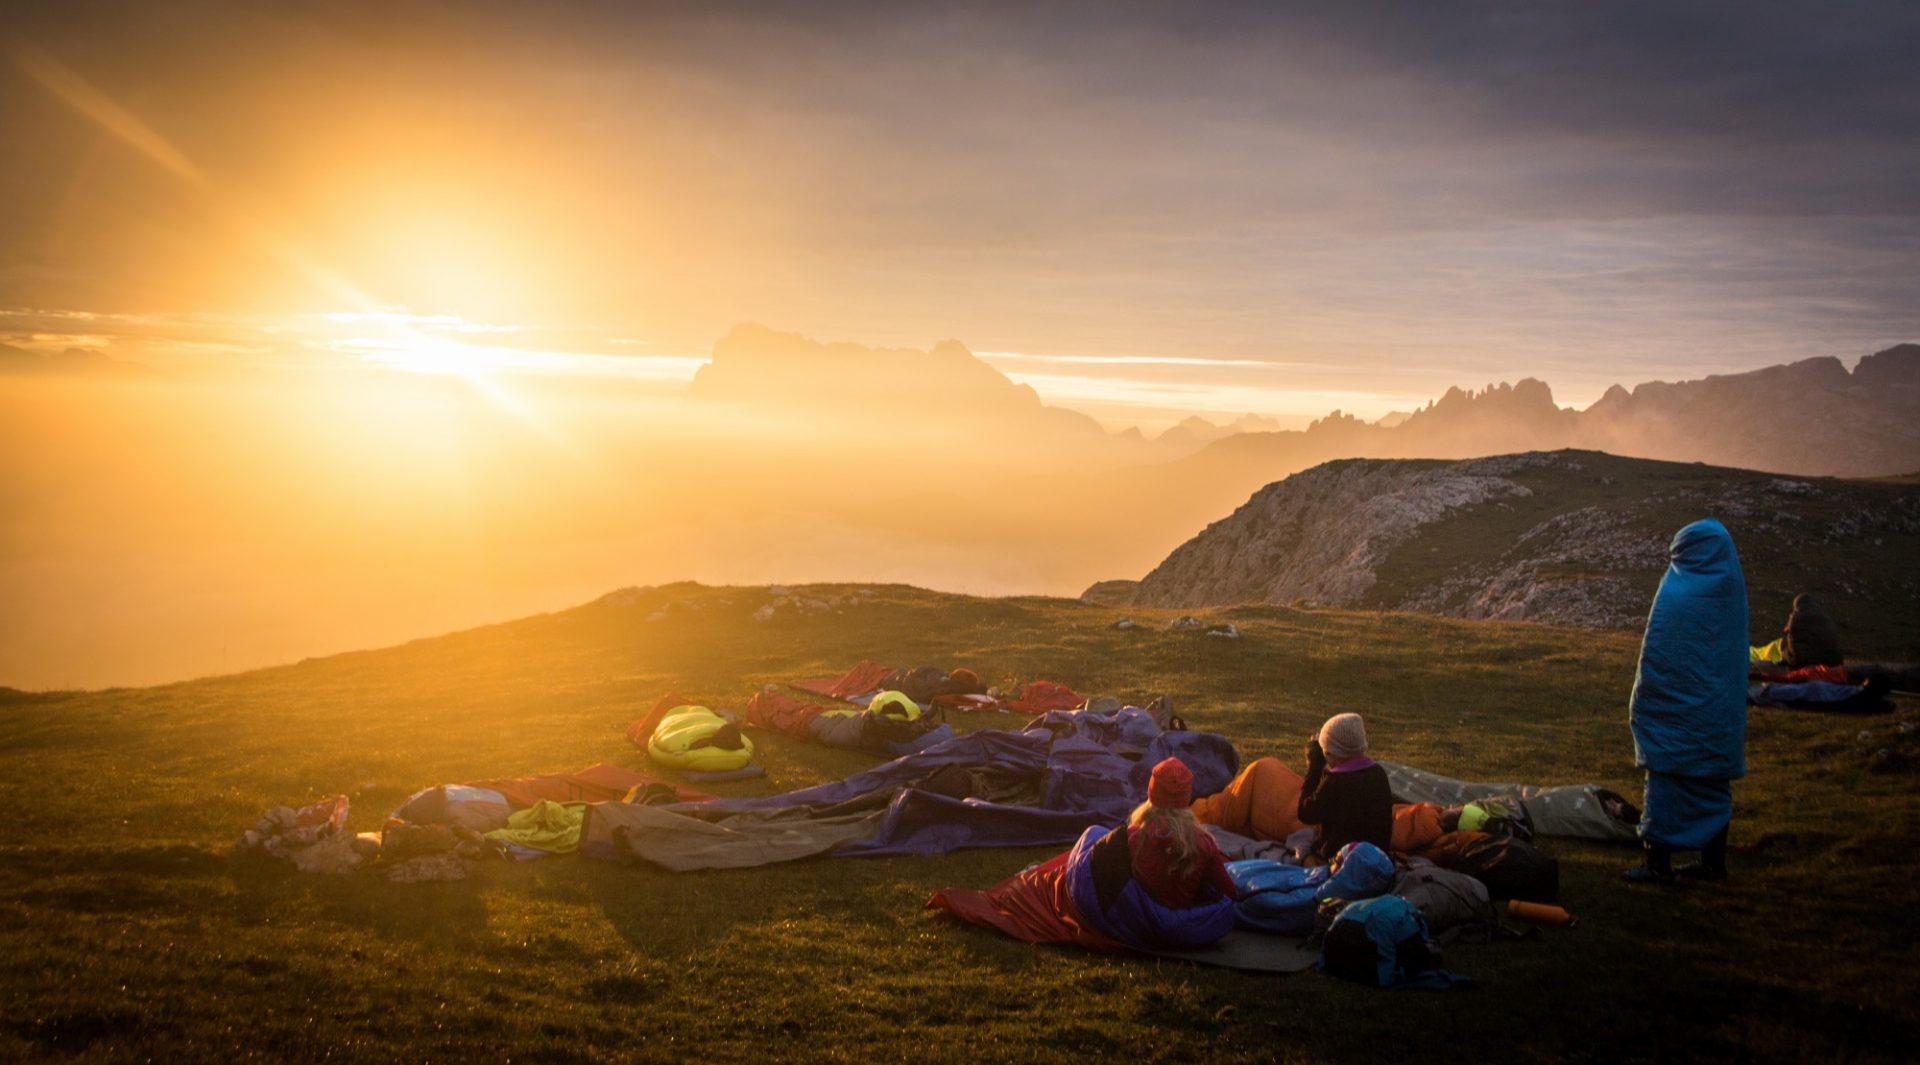 Bergsteigertipp: Schlafsack & Isomate